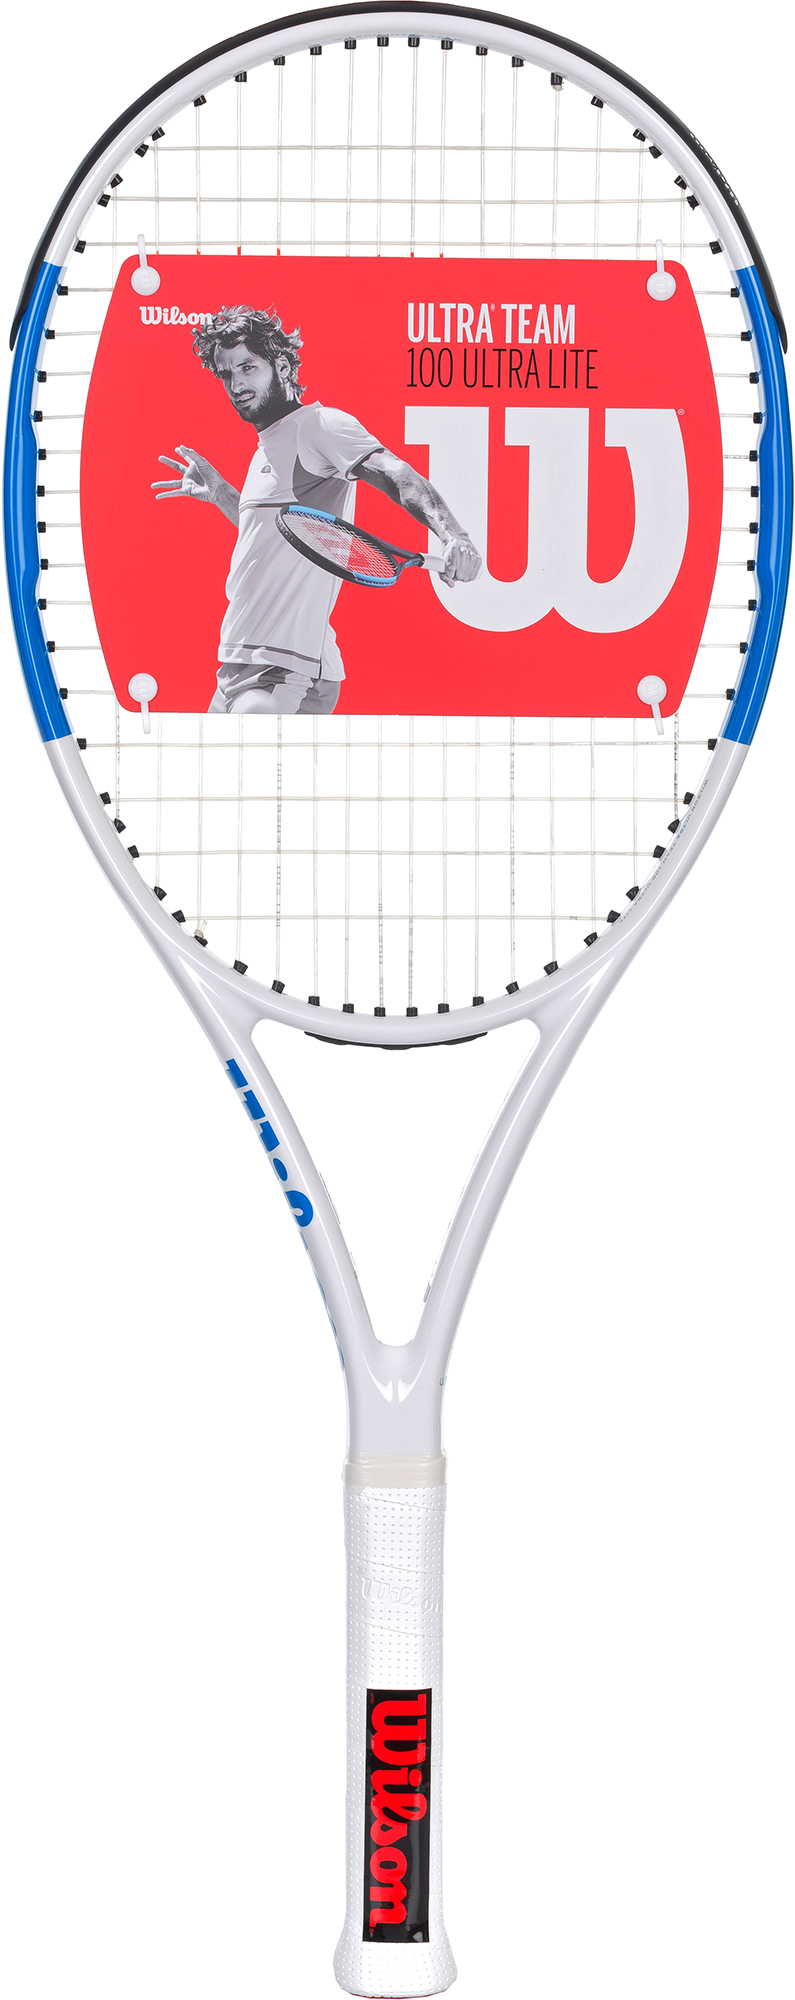 Wilson Ракетка для большого тенниса Wilson Ultra Team 100 UL, размер 2 wilson ракетка для большого тенниса детская wilson roger federer 23 размер без размера